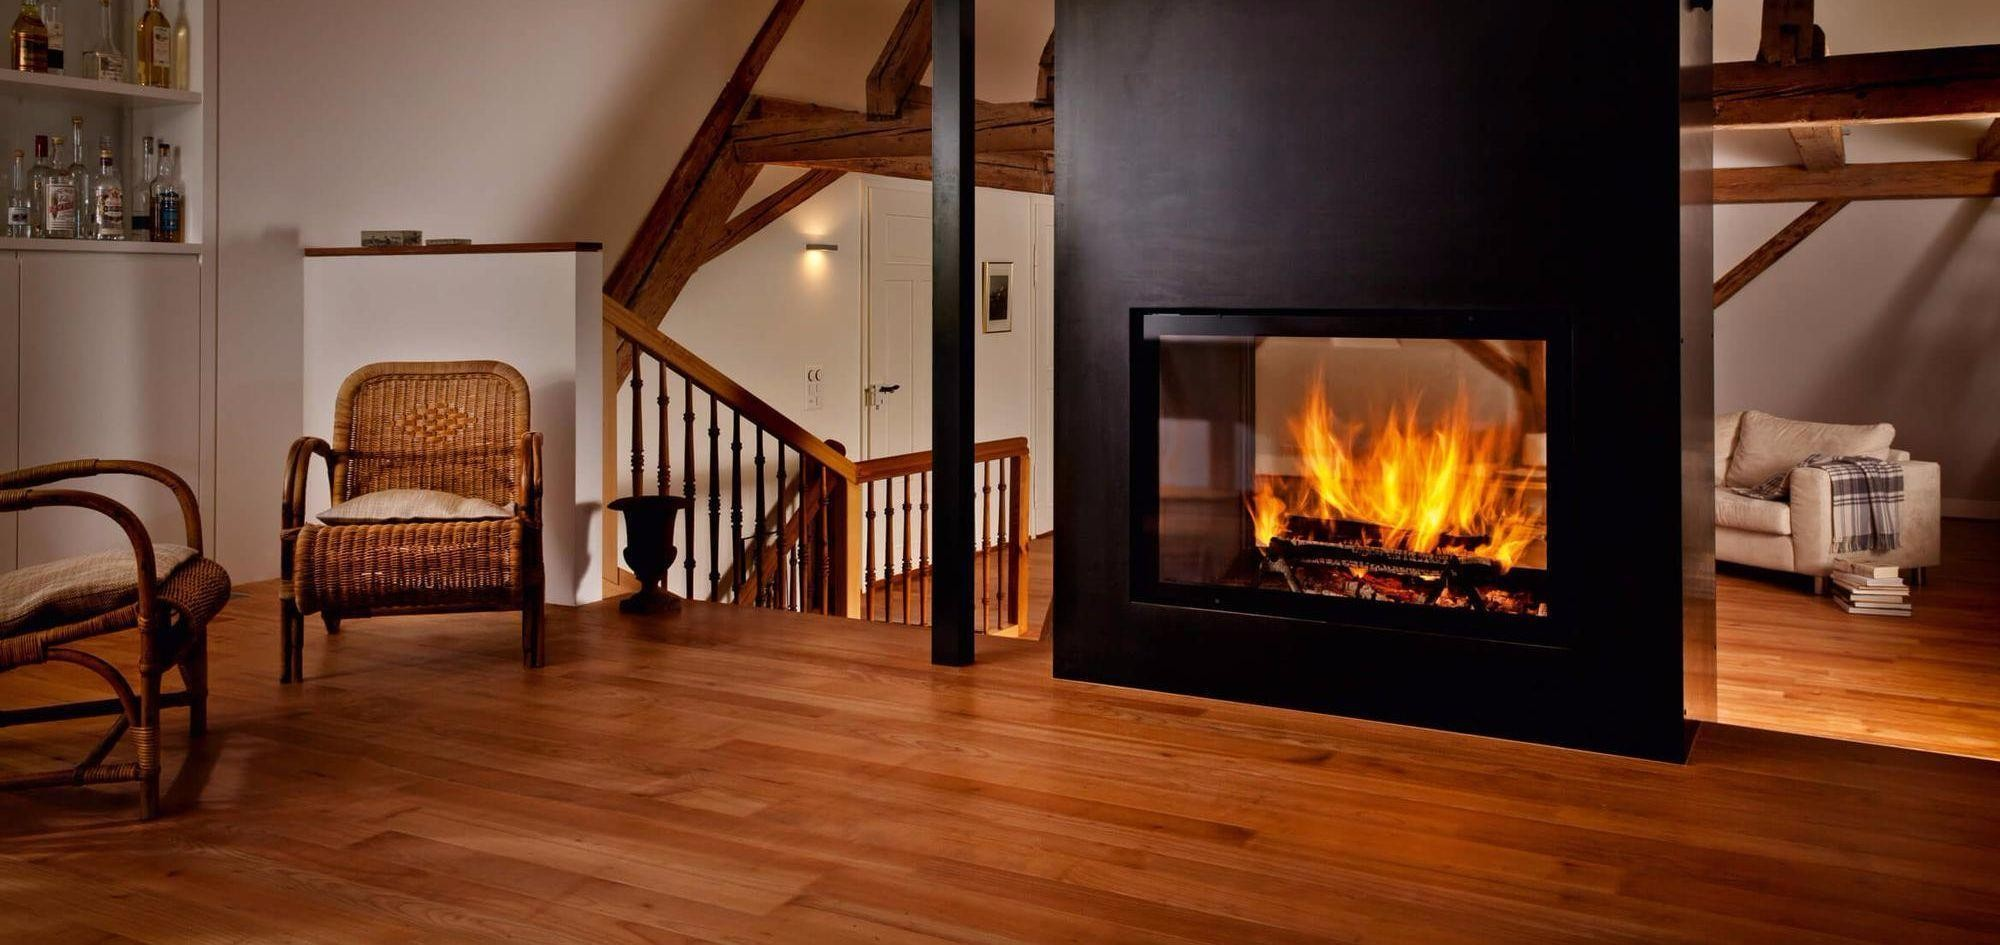 Ruegg Kamin fireplaces cheminée kamin ofen